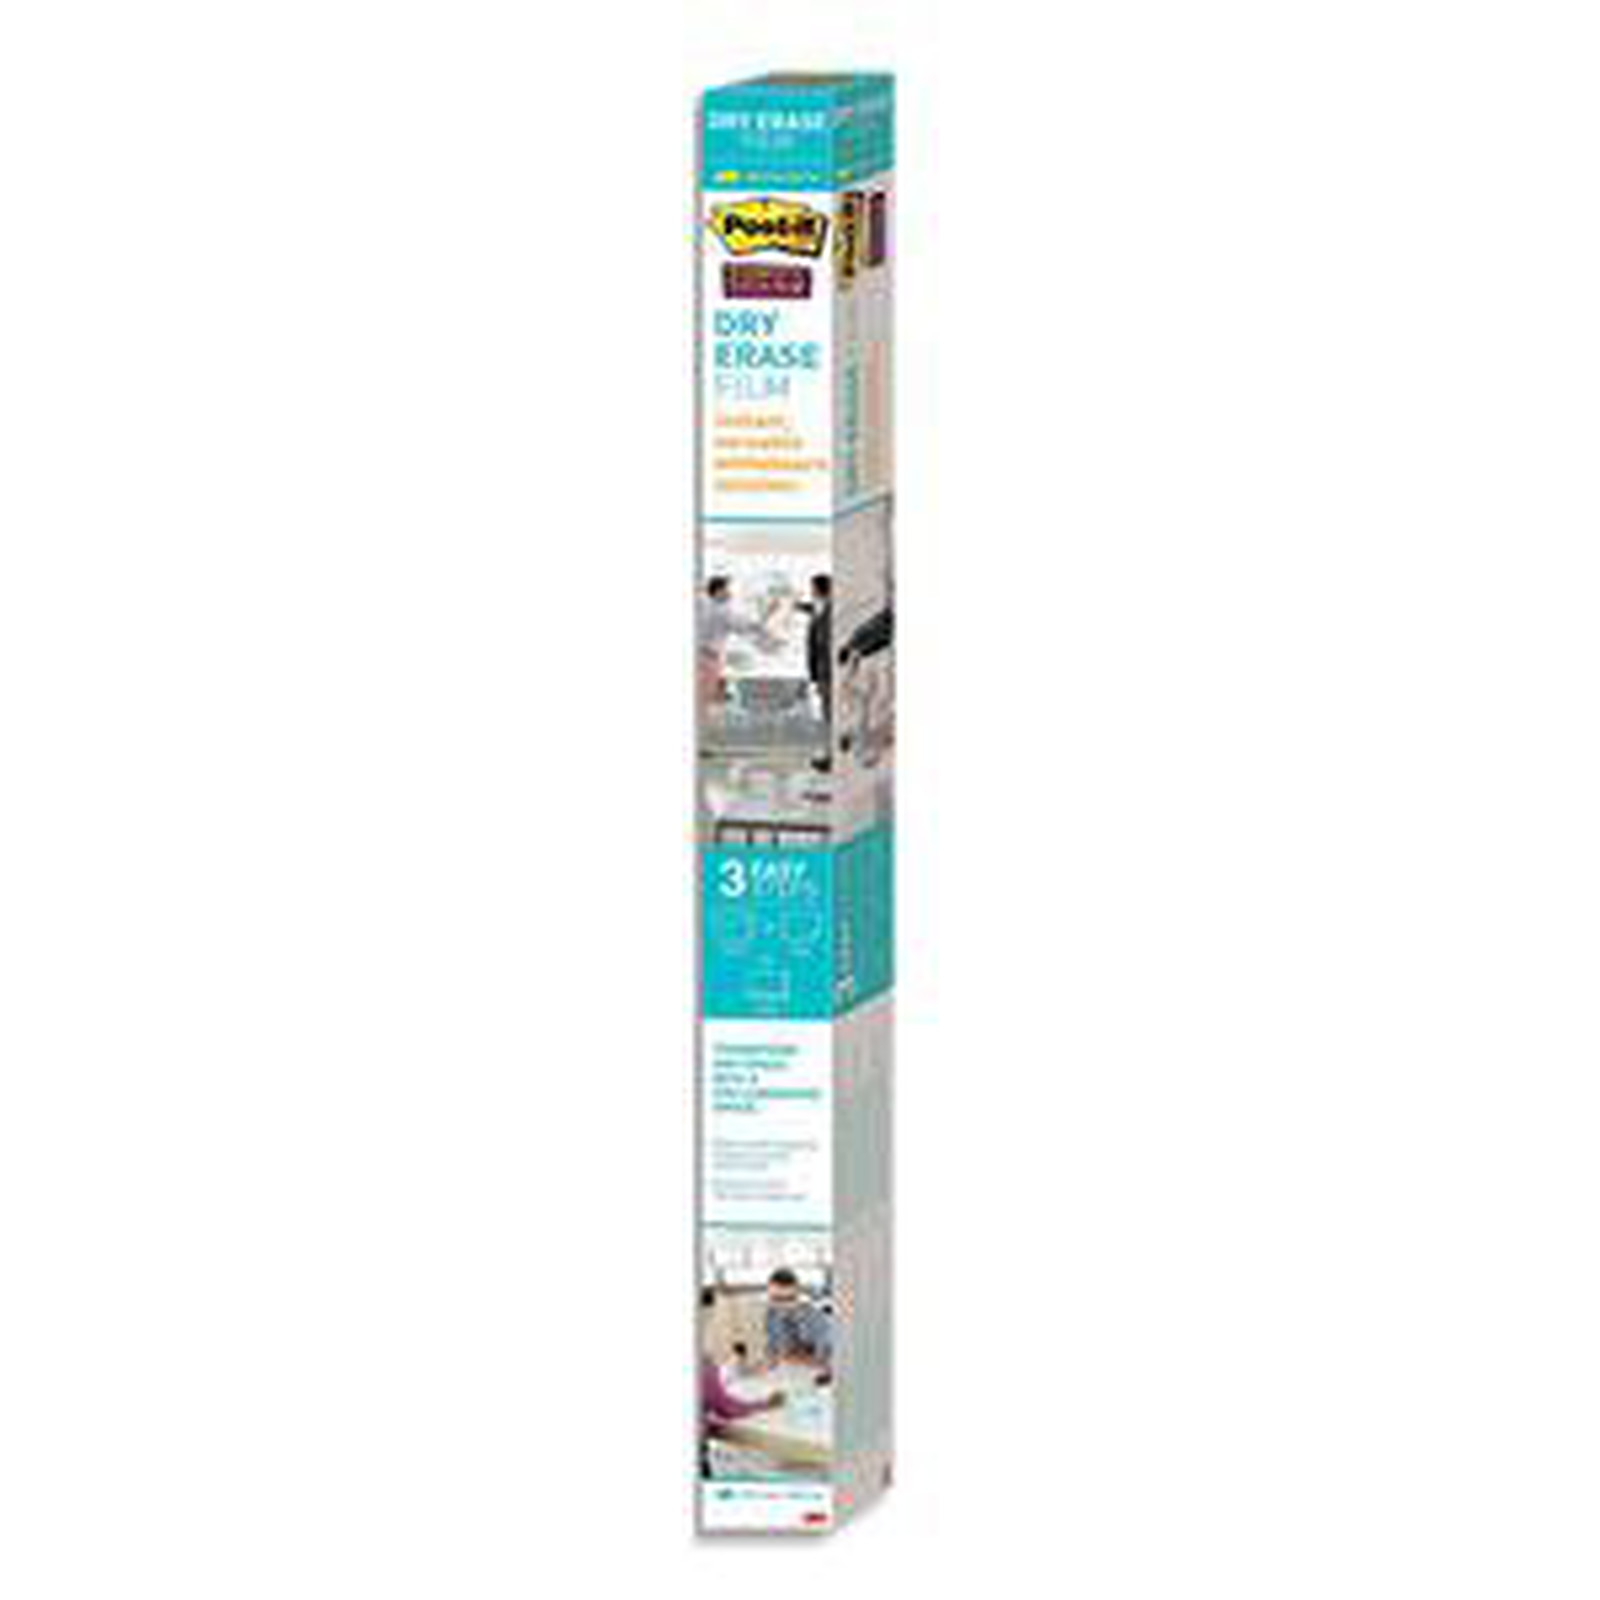 Post-it Tableau blanc en rouleau Super Sticky 1219 mm x 1829 mm